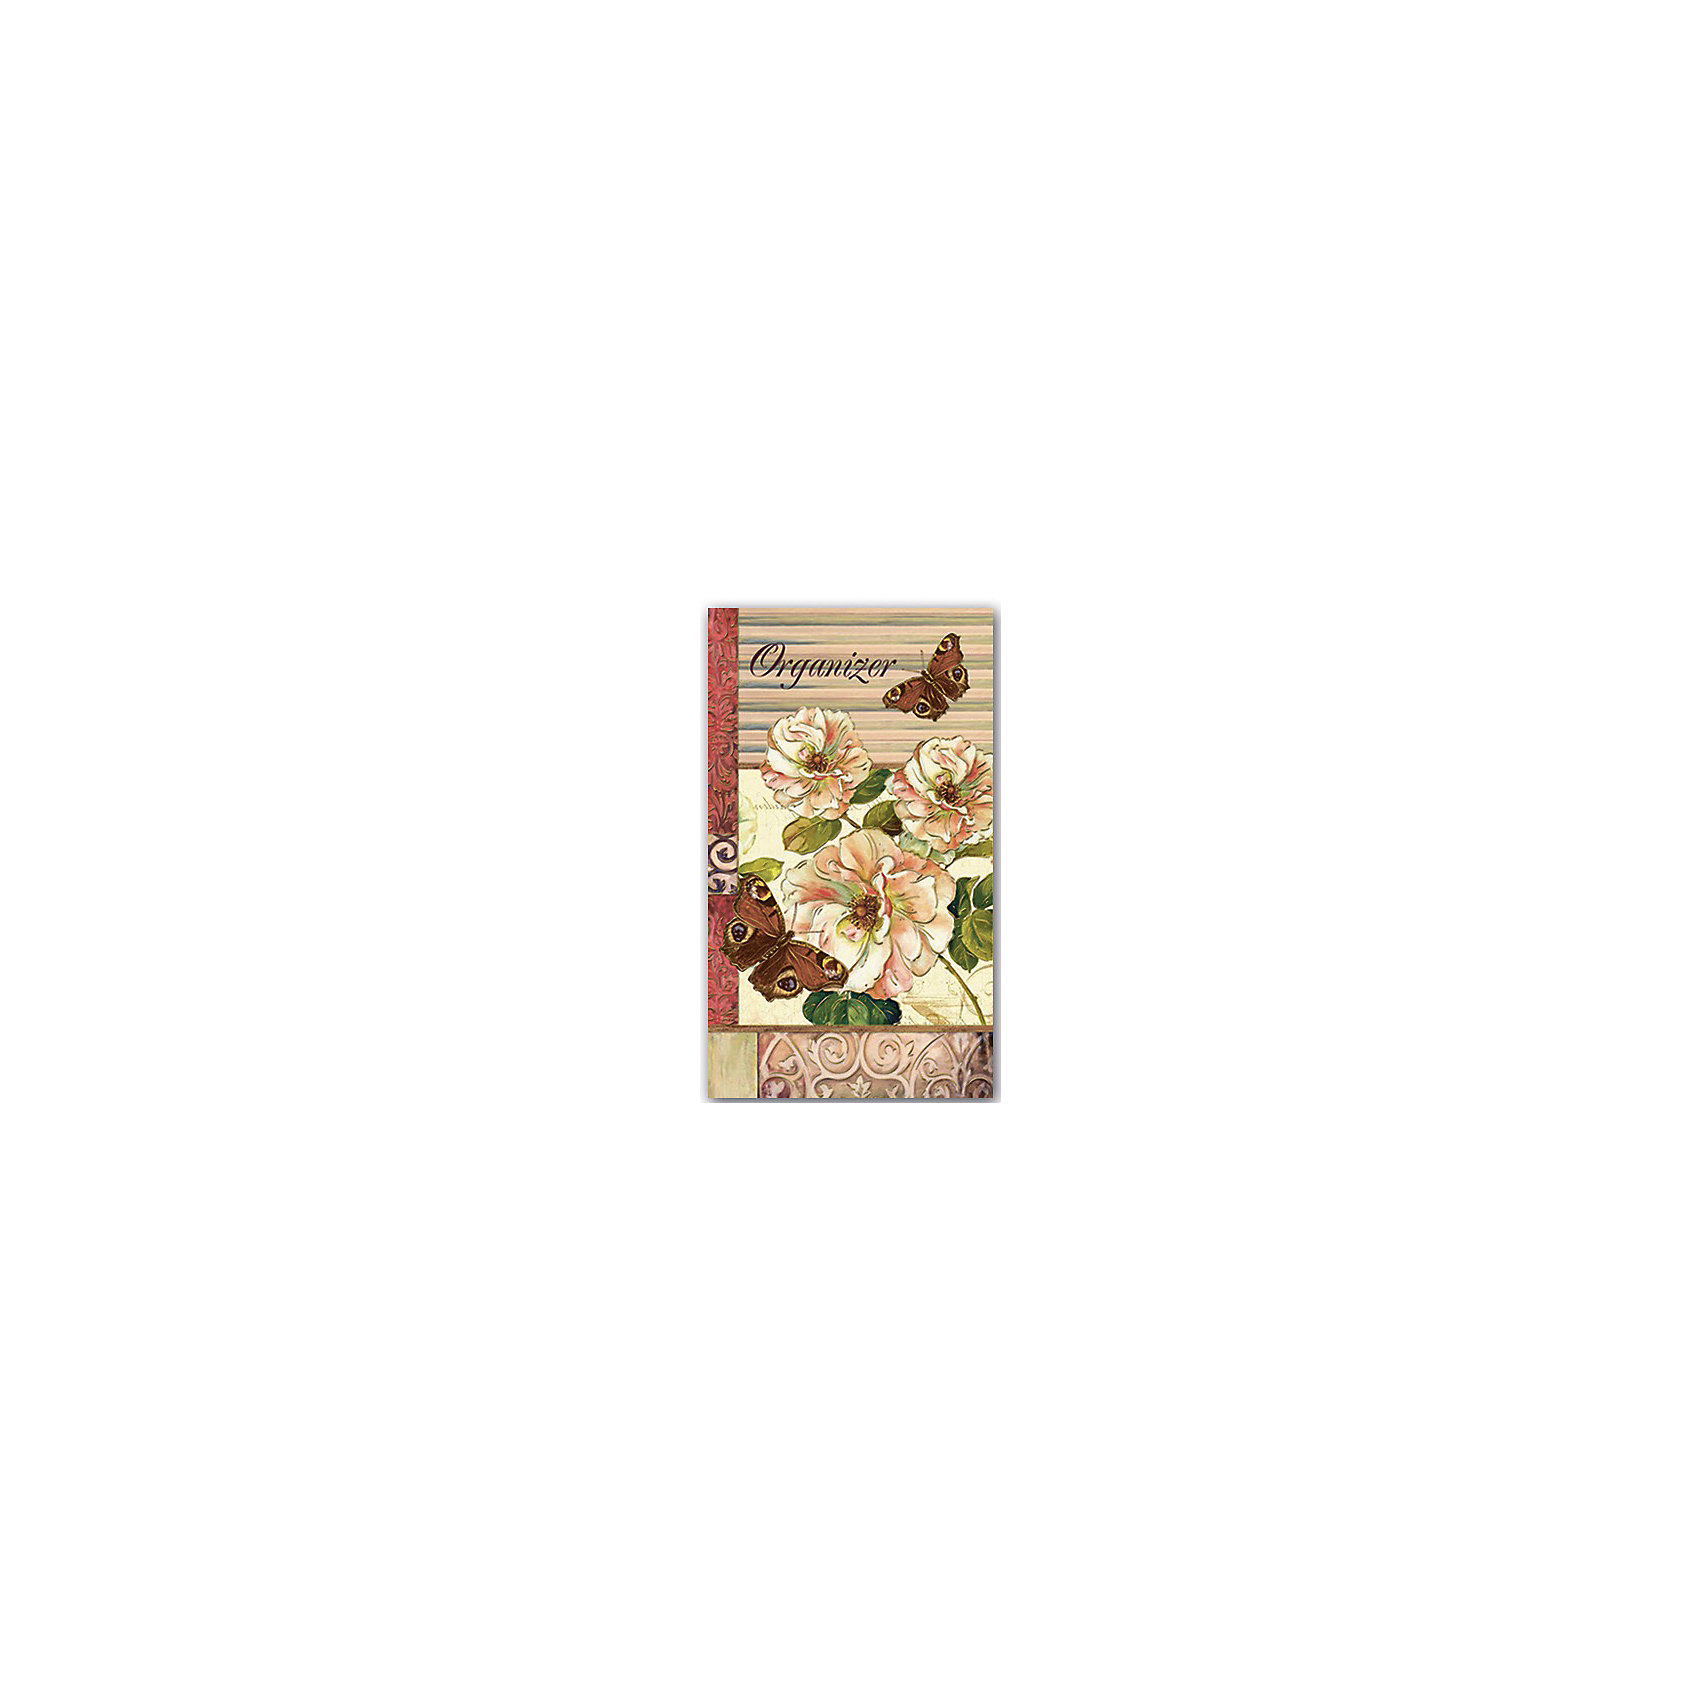 Феникс+ Органайзер трехблочный Бабочки блокнот власта артбук бабочки 7 5 х 10 см 150 листов